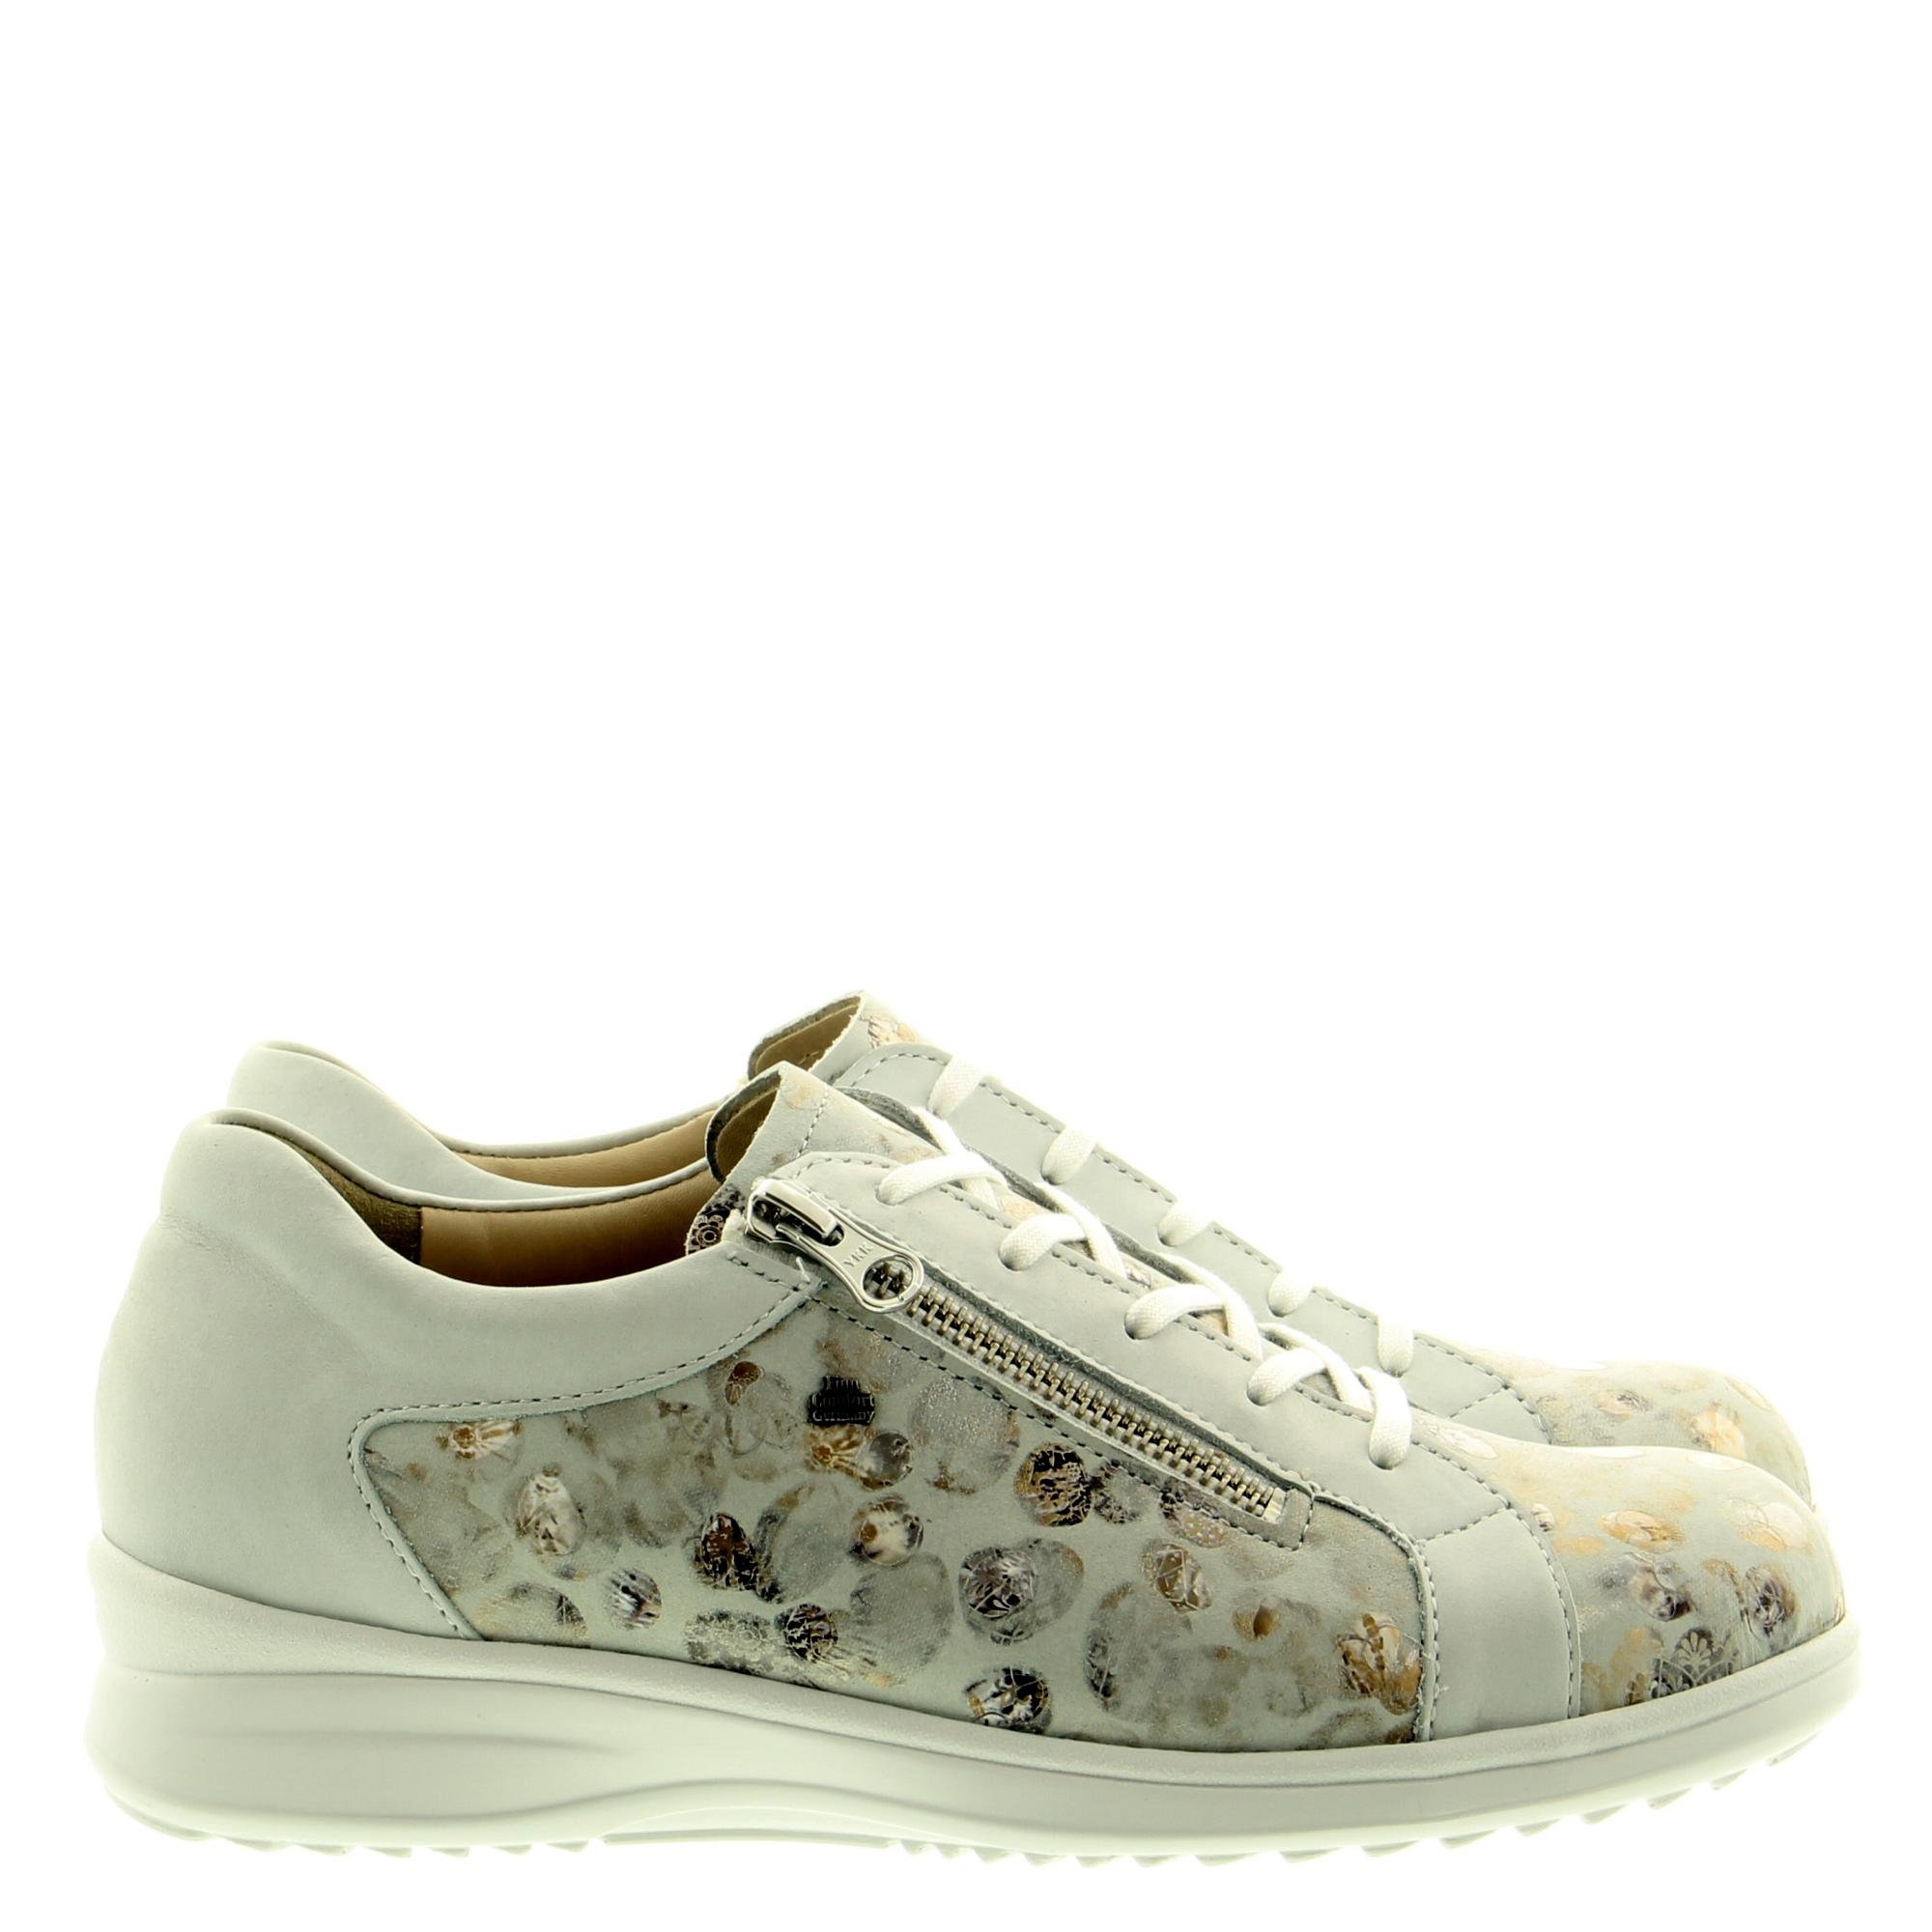 Finn Comfort Bexley 02231 Stone Bianco Pebble 902141